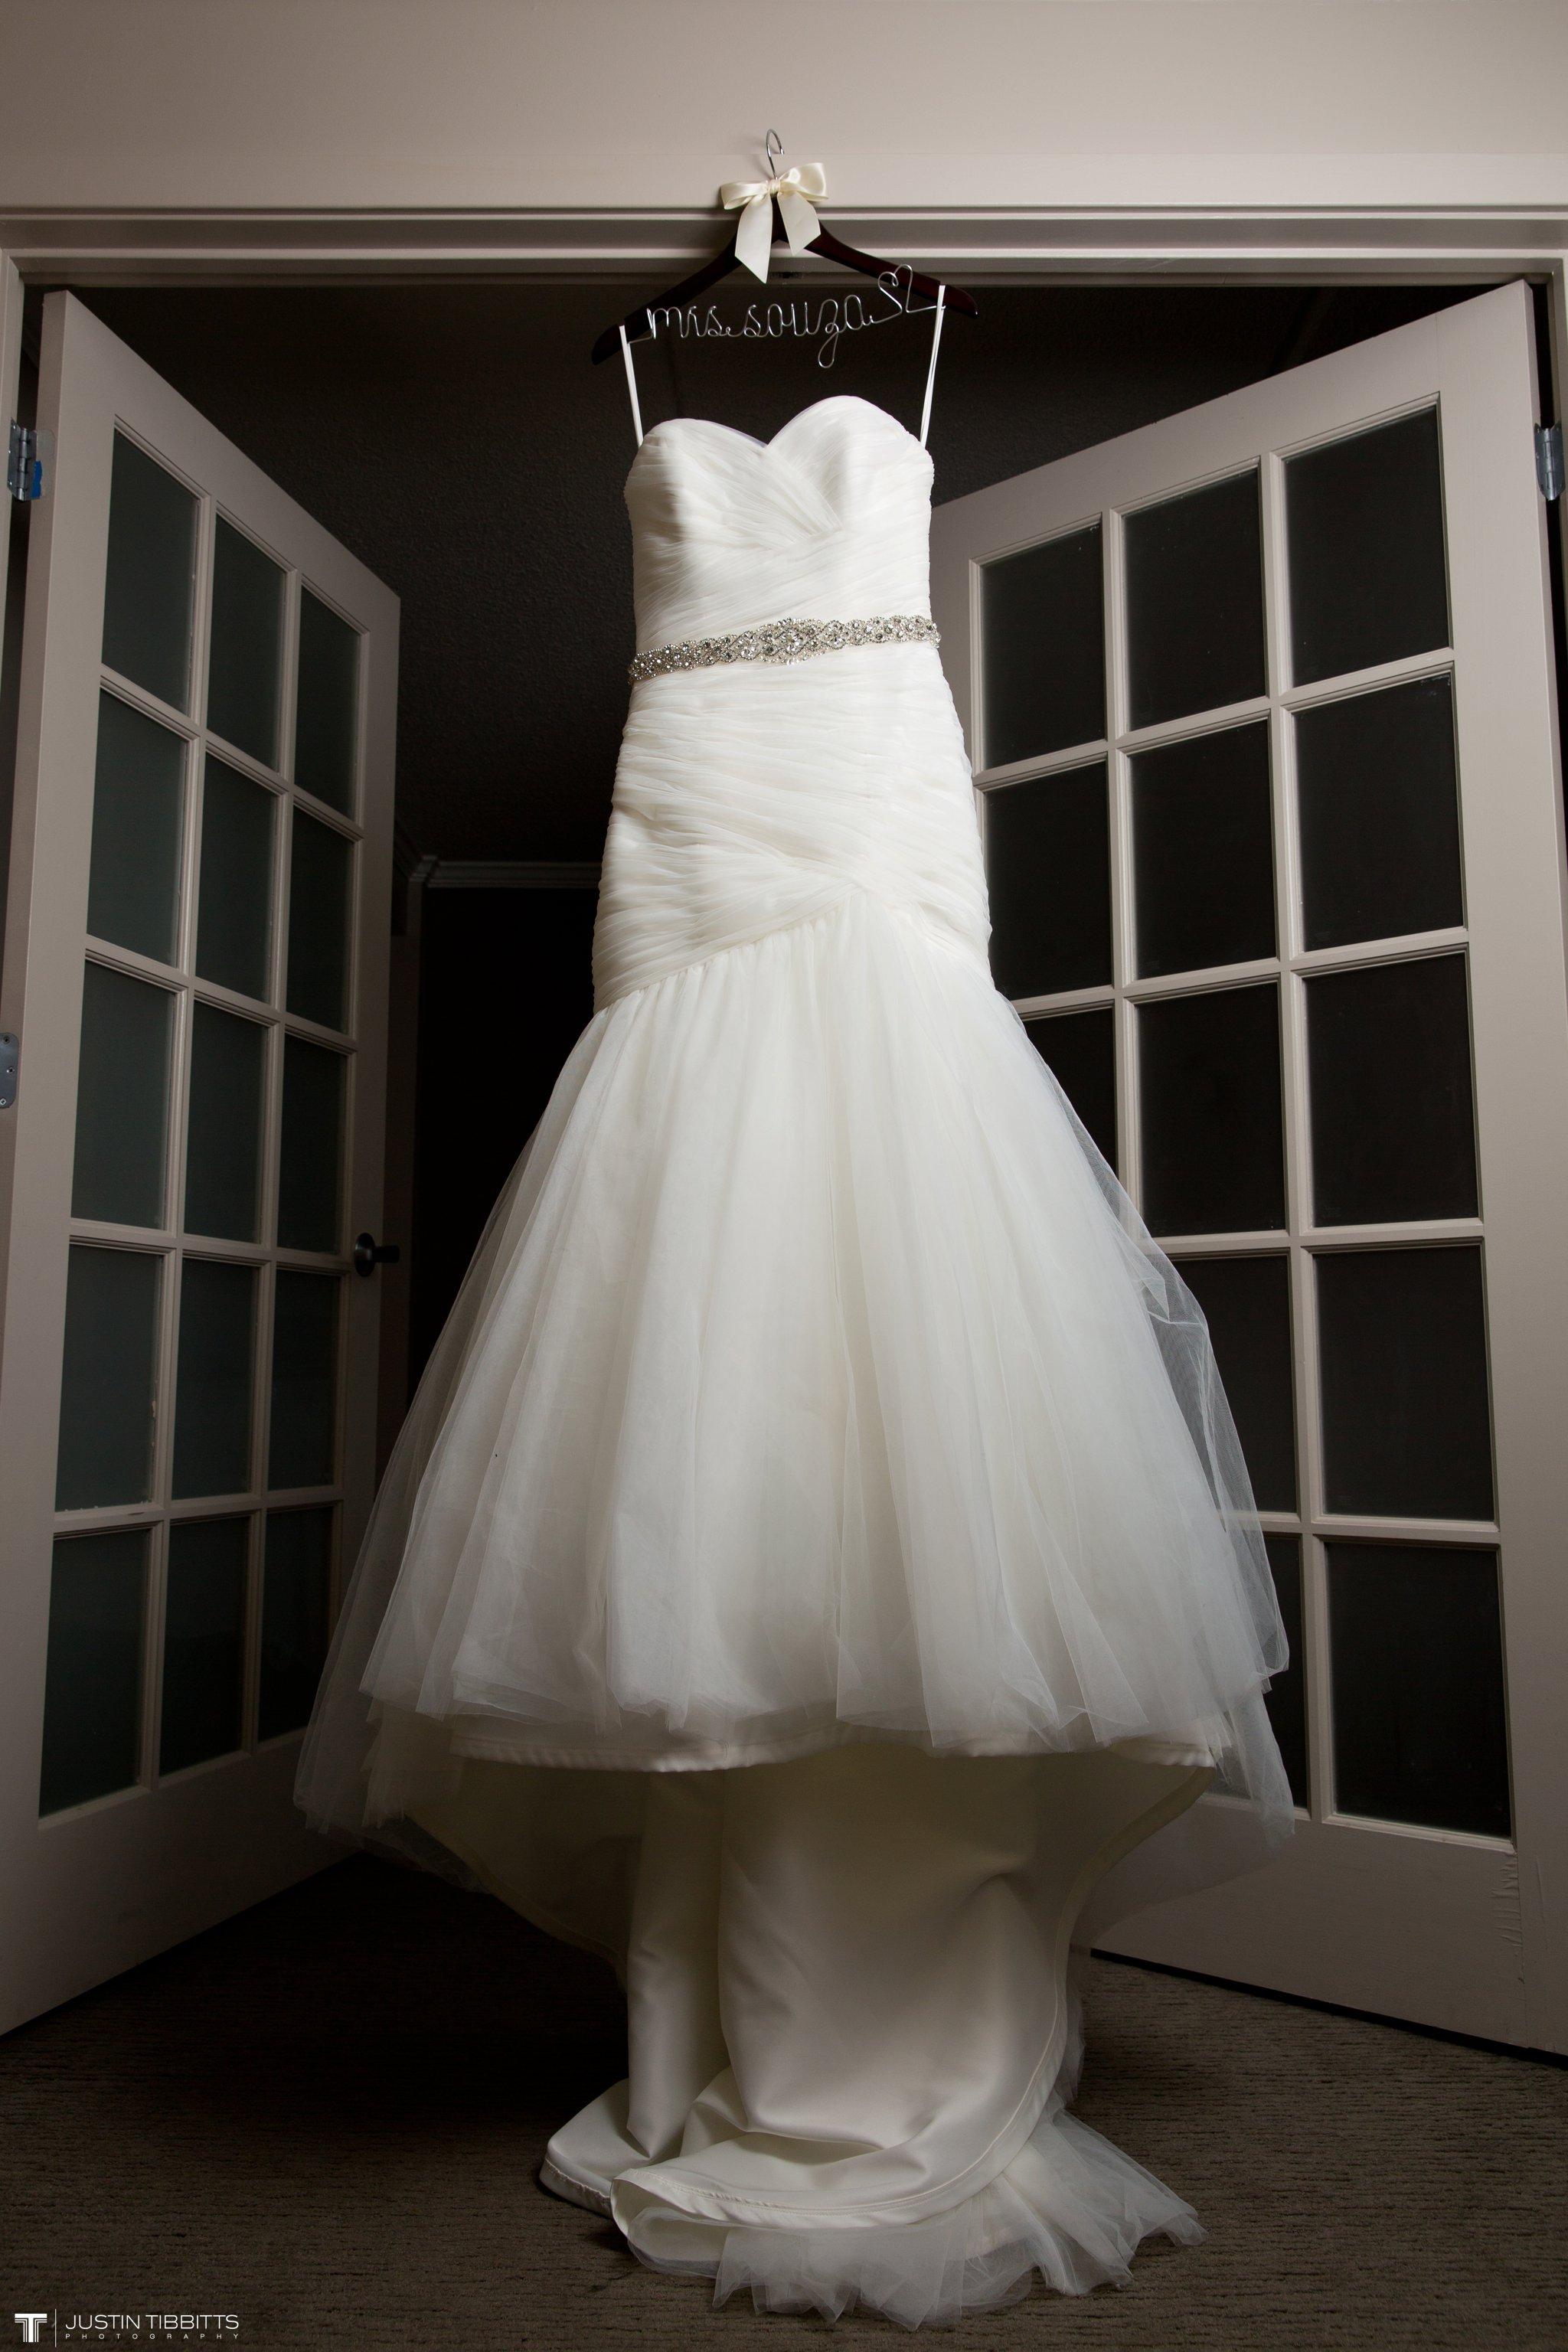 state-room-wedding-photos-with-amanda-and-nick_0002